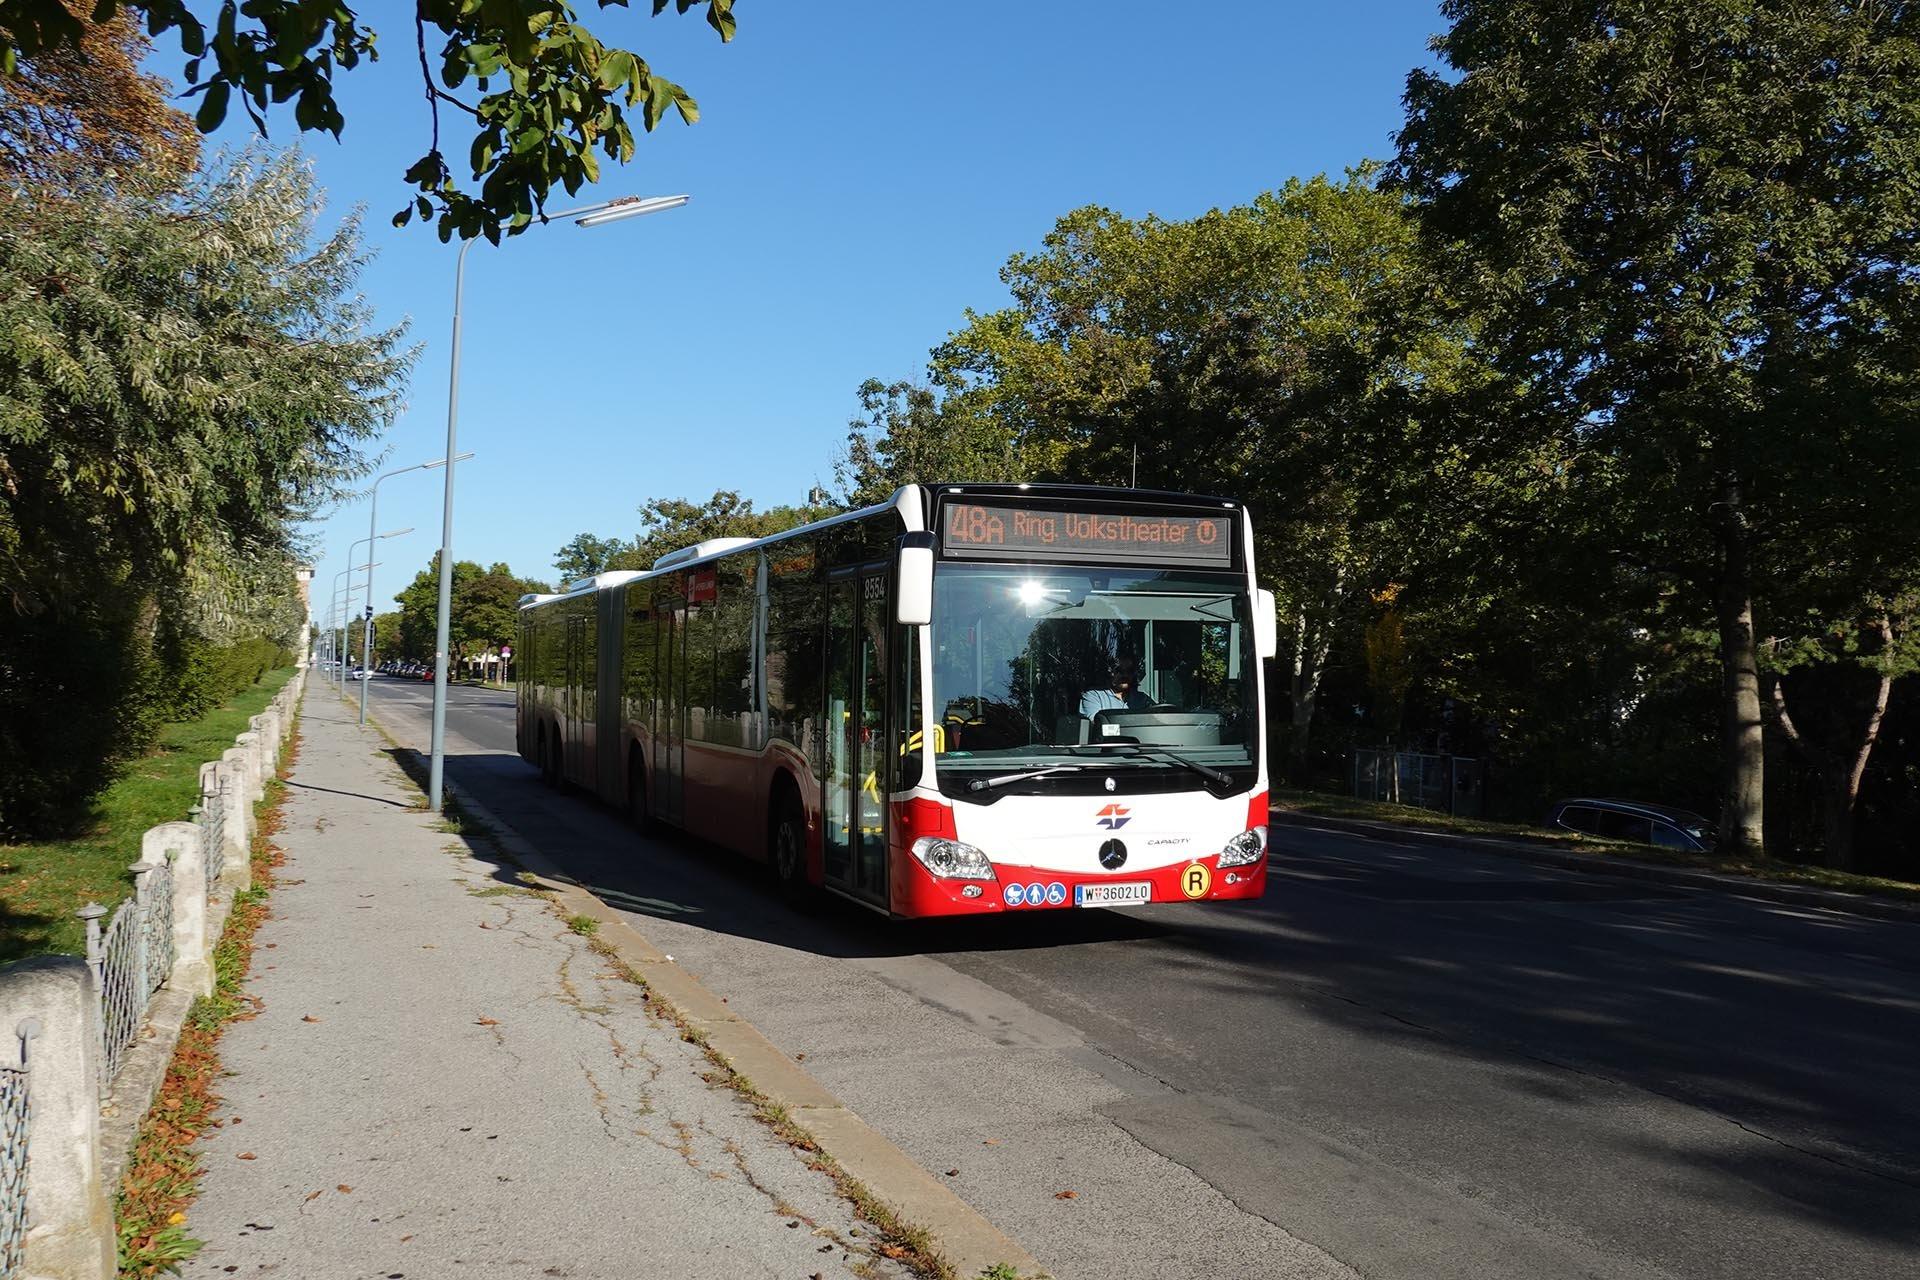 https://public-transport.net/bus/Wien_Bus/NG265XL/slides/9109_777.jpg